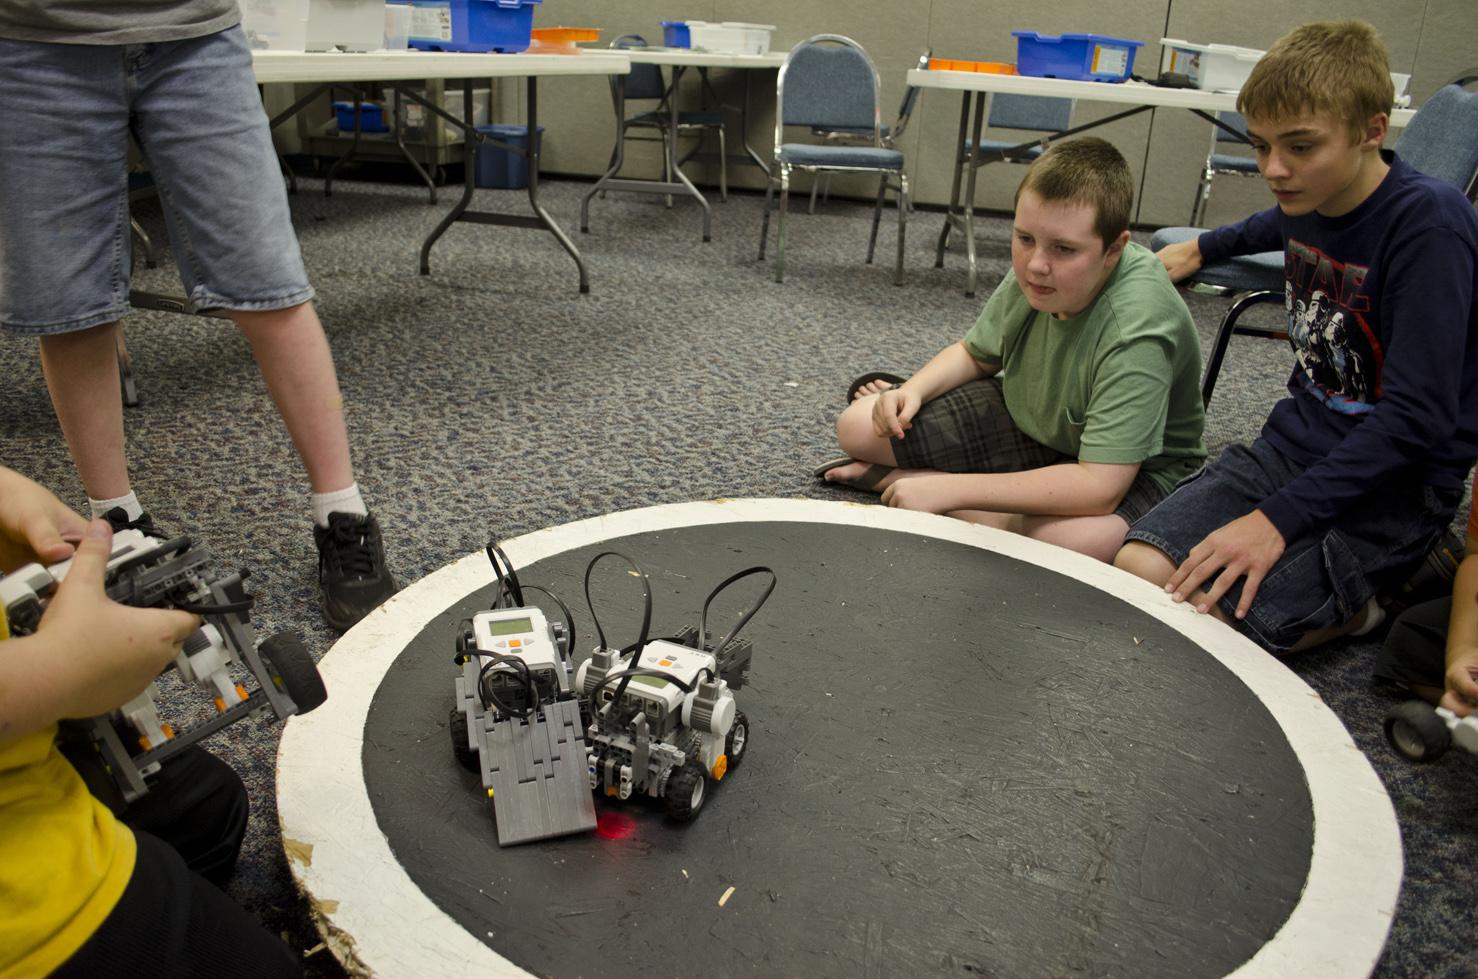 KCC offers Lego engineering, robotics camps over spring break ...